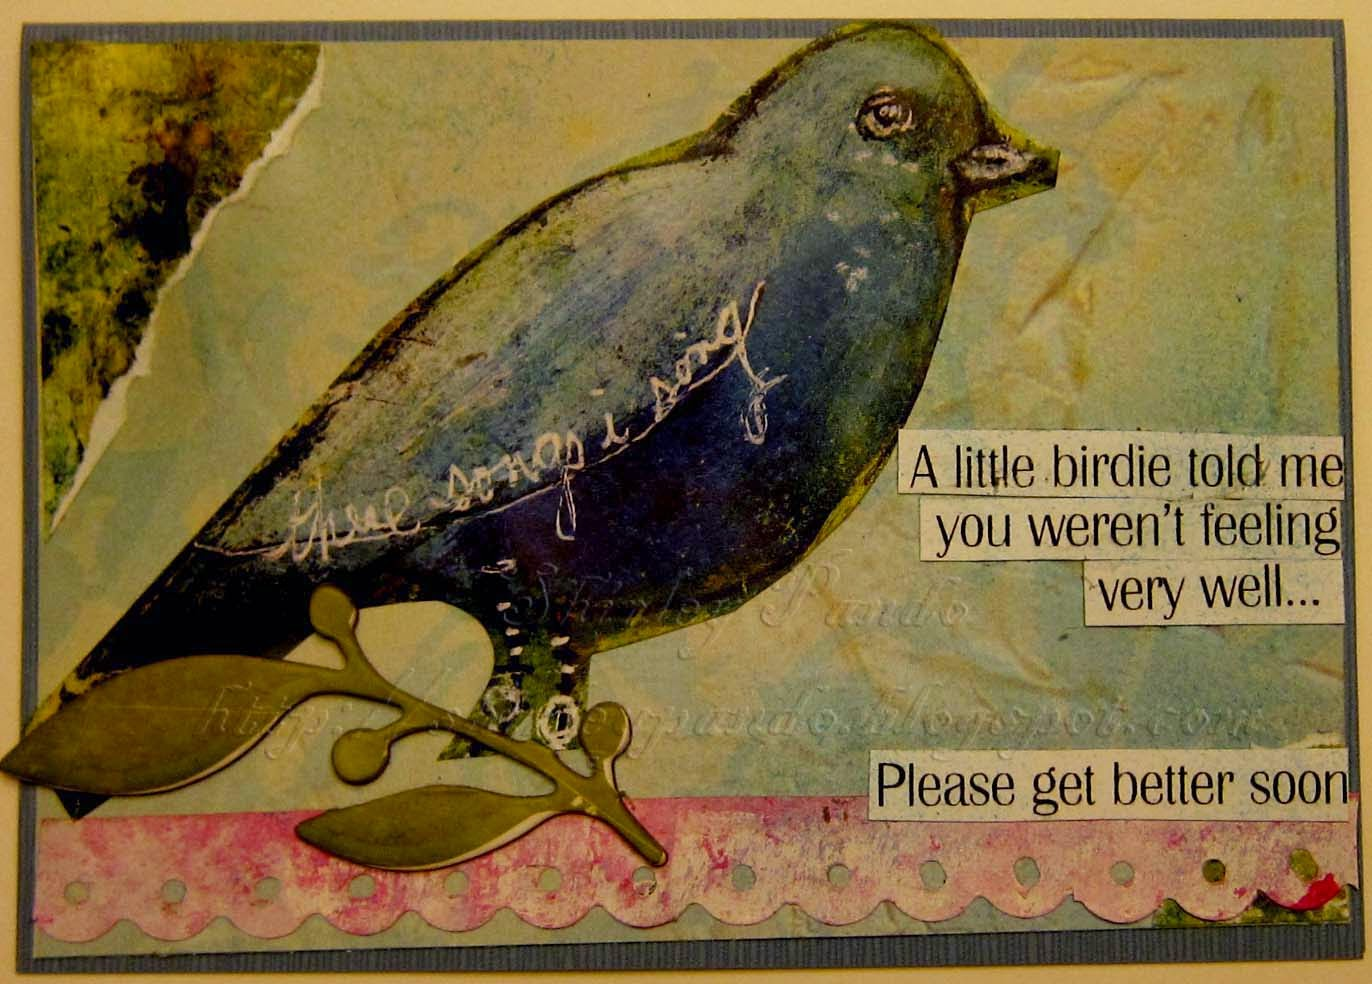 A Little Birdie... (1)